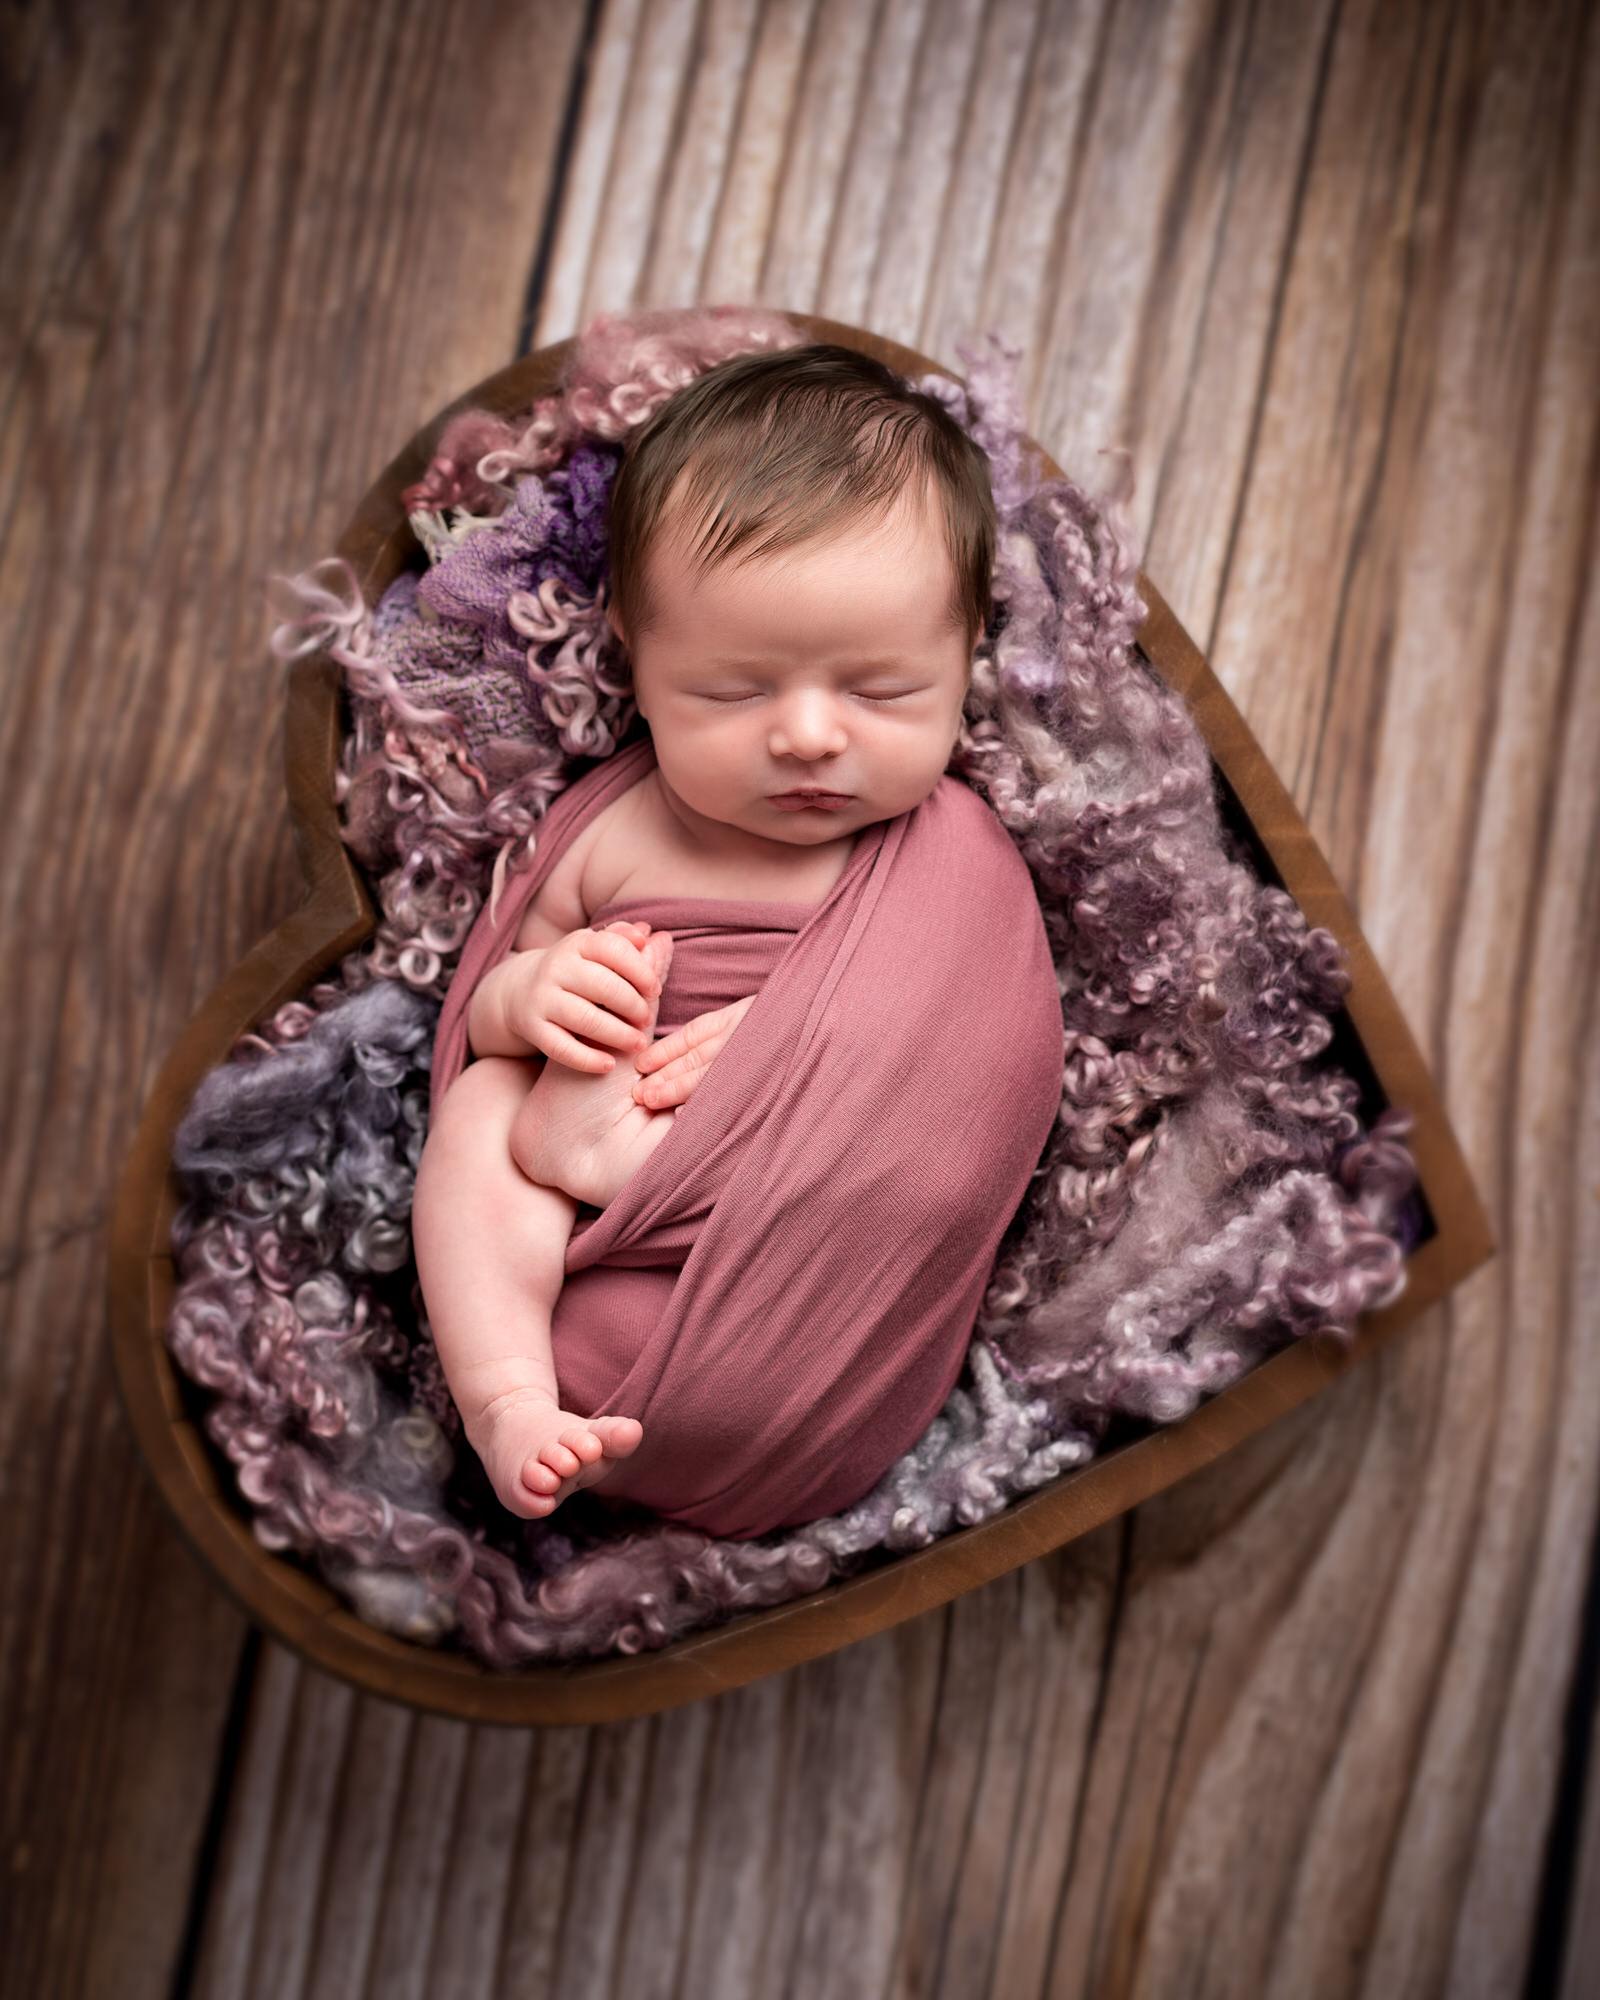 Newborn_baby_photographer_dudley_midlands_posing_in_bed